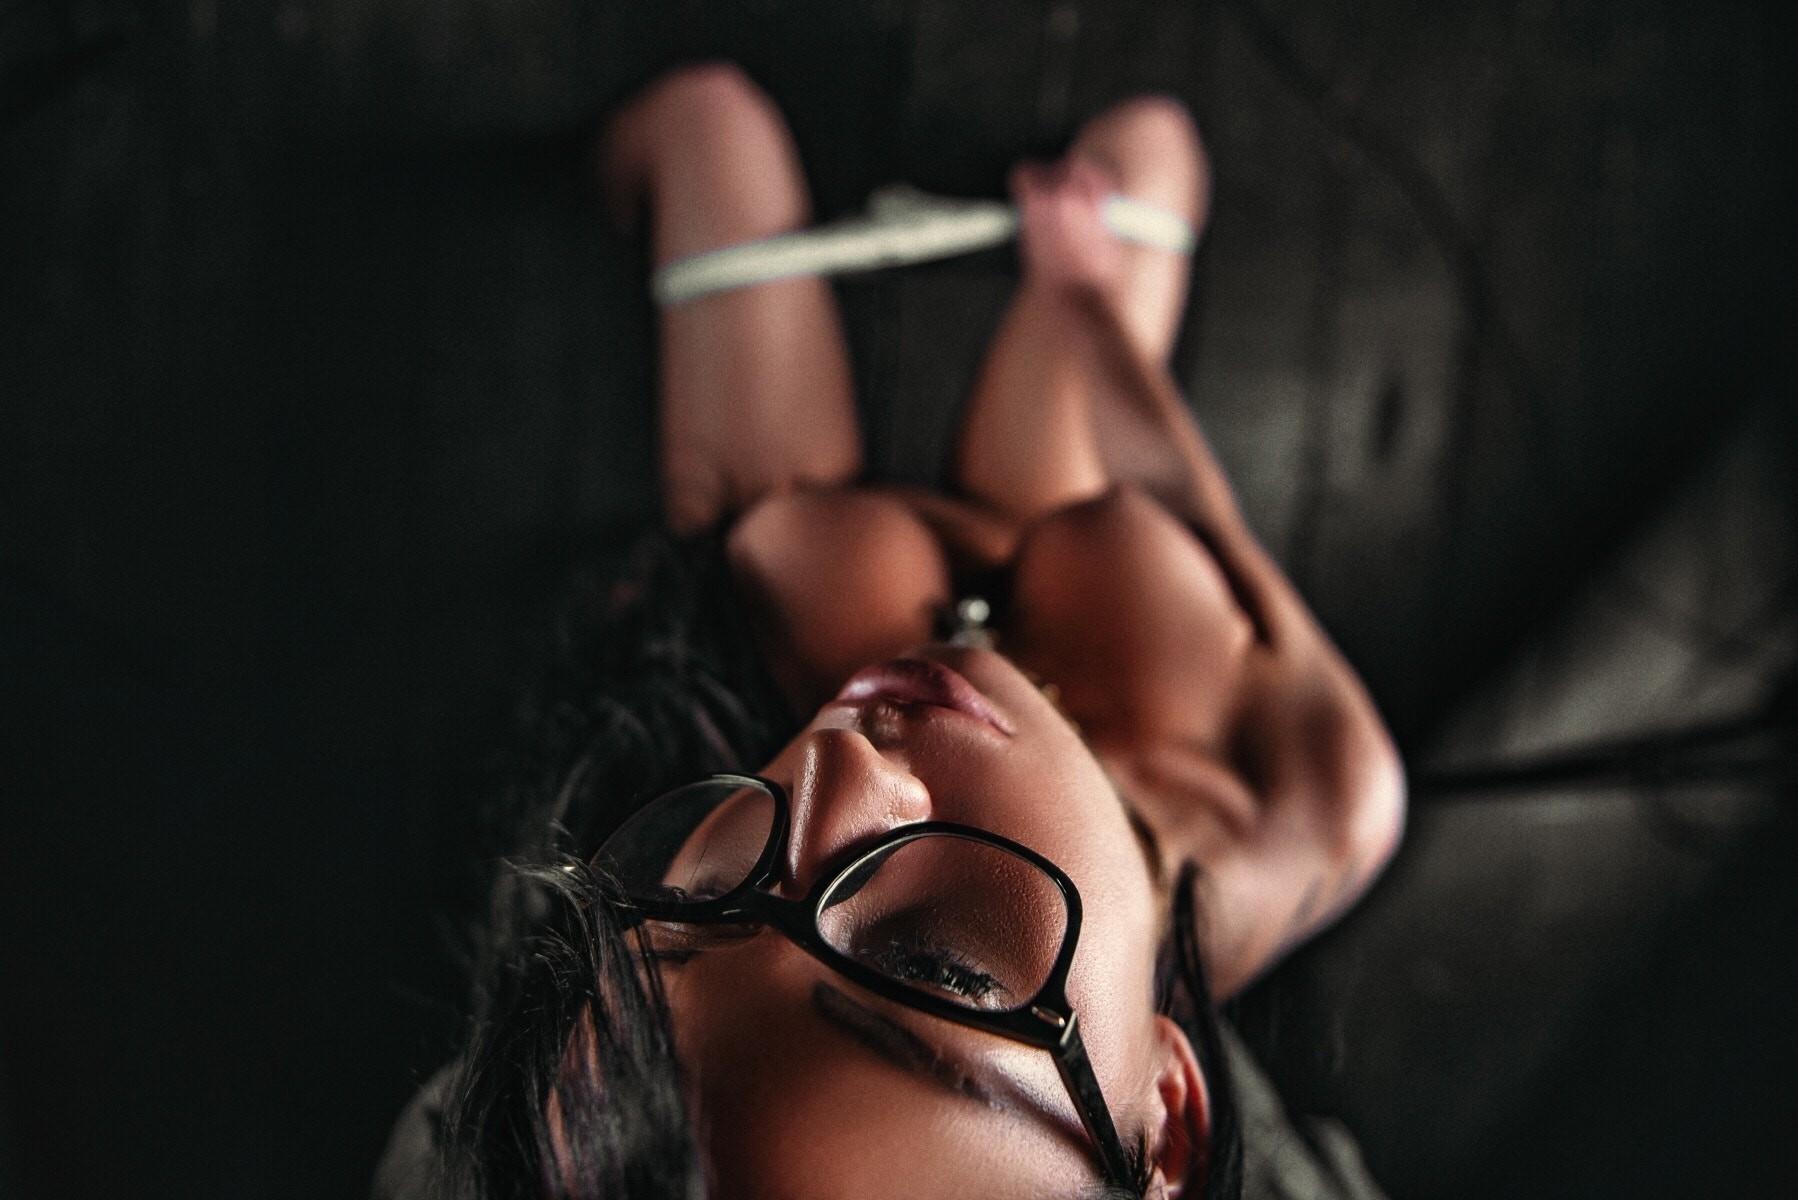 Hd porn original wallpaper nude